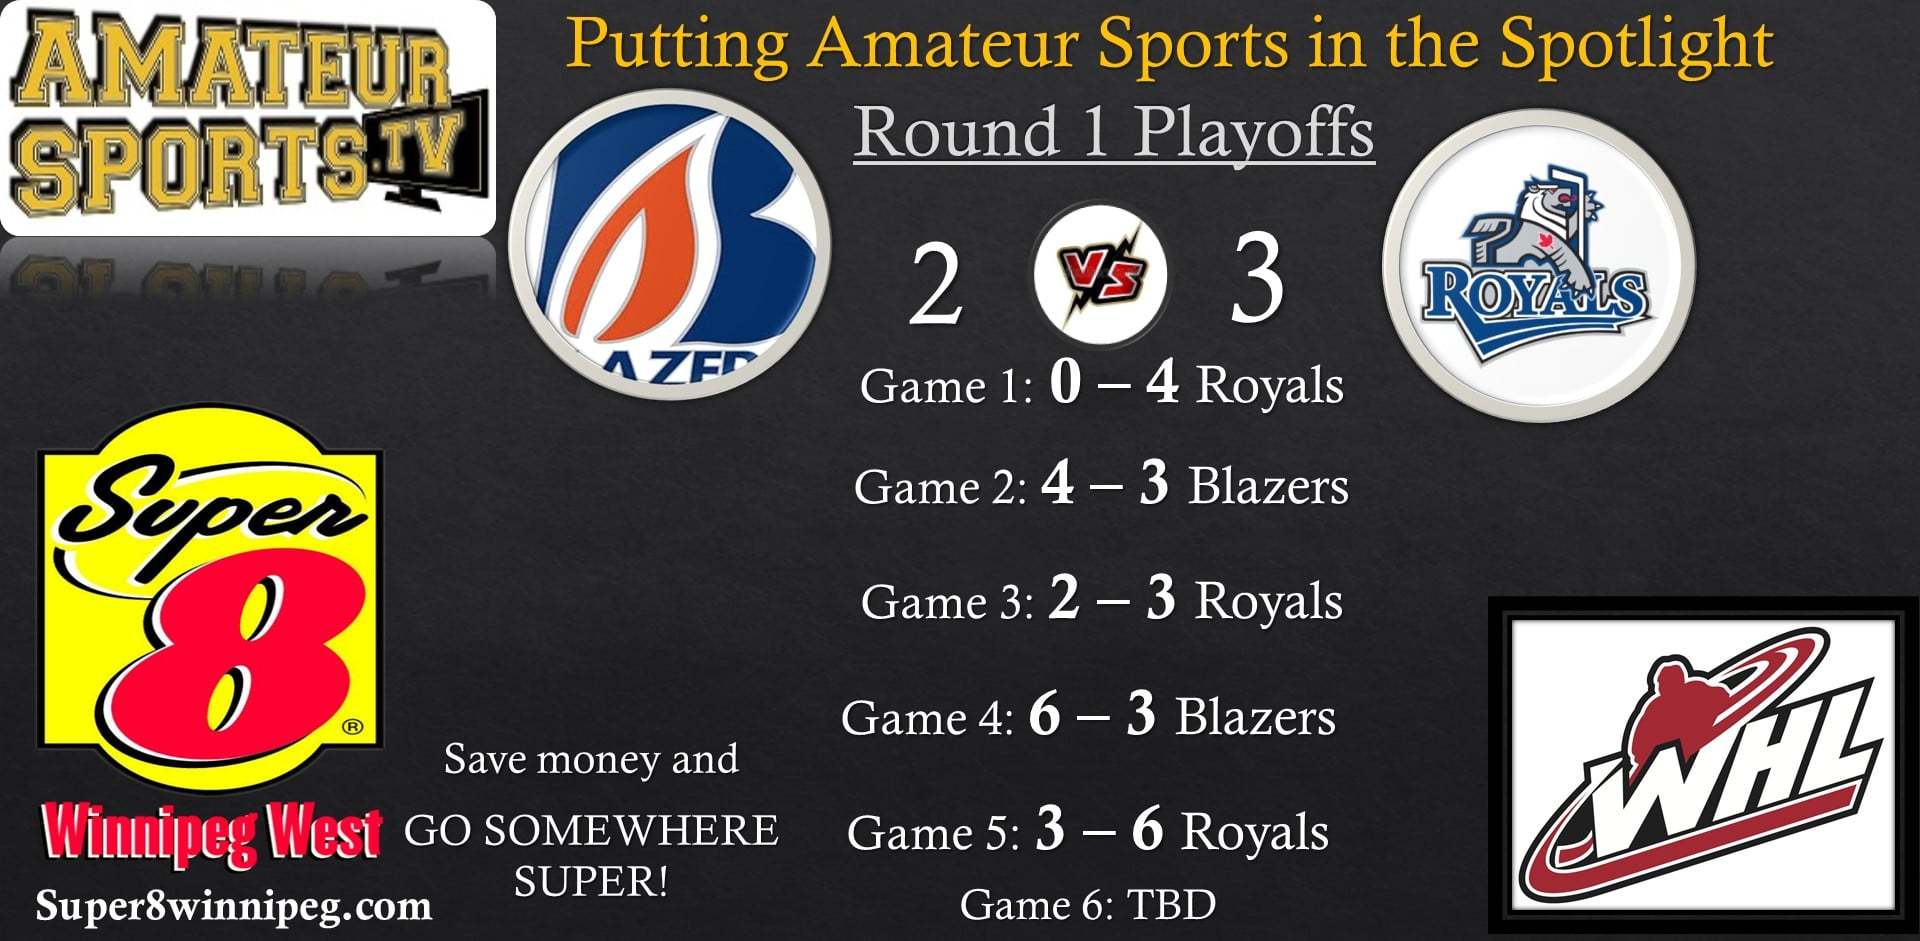 2 Royals vs Blazers